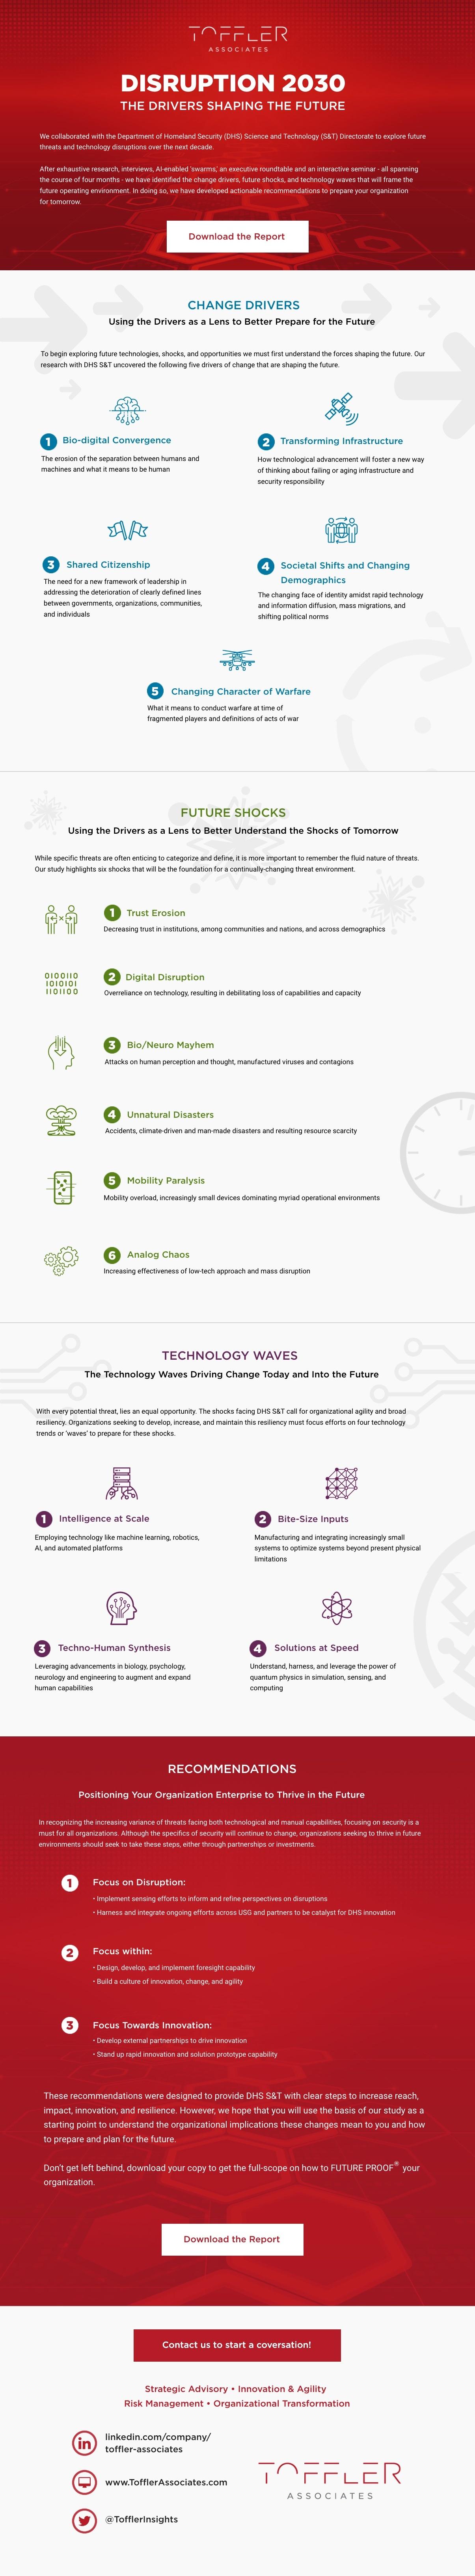 disruption2030_infographic